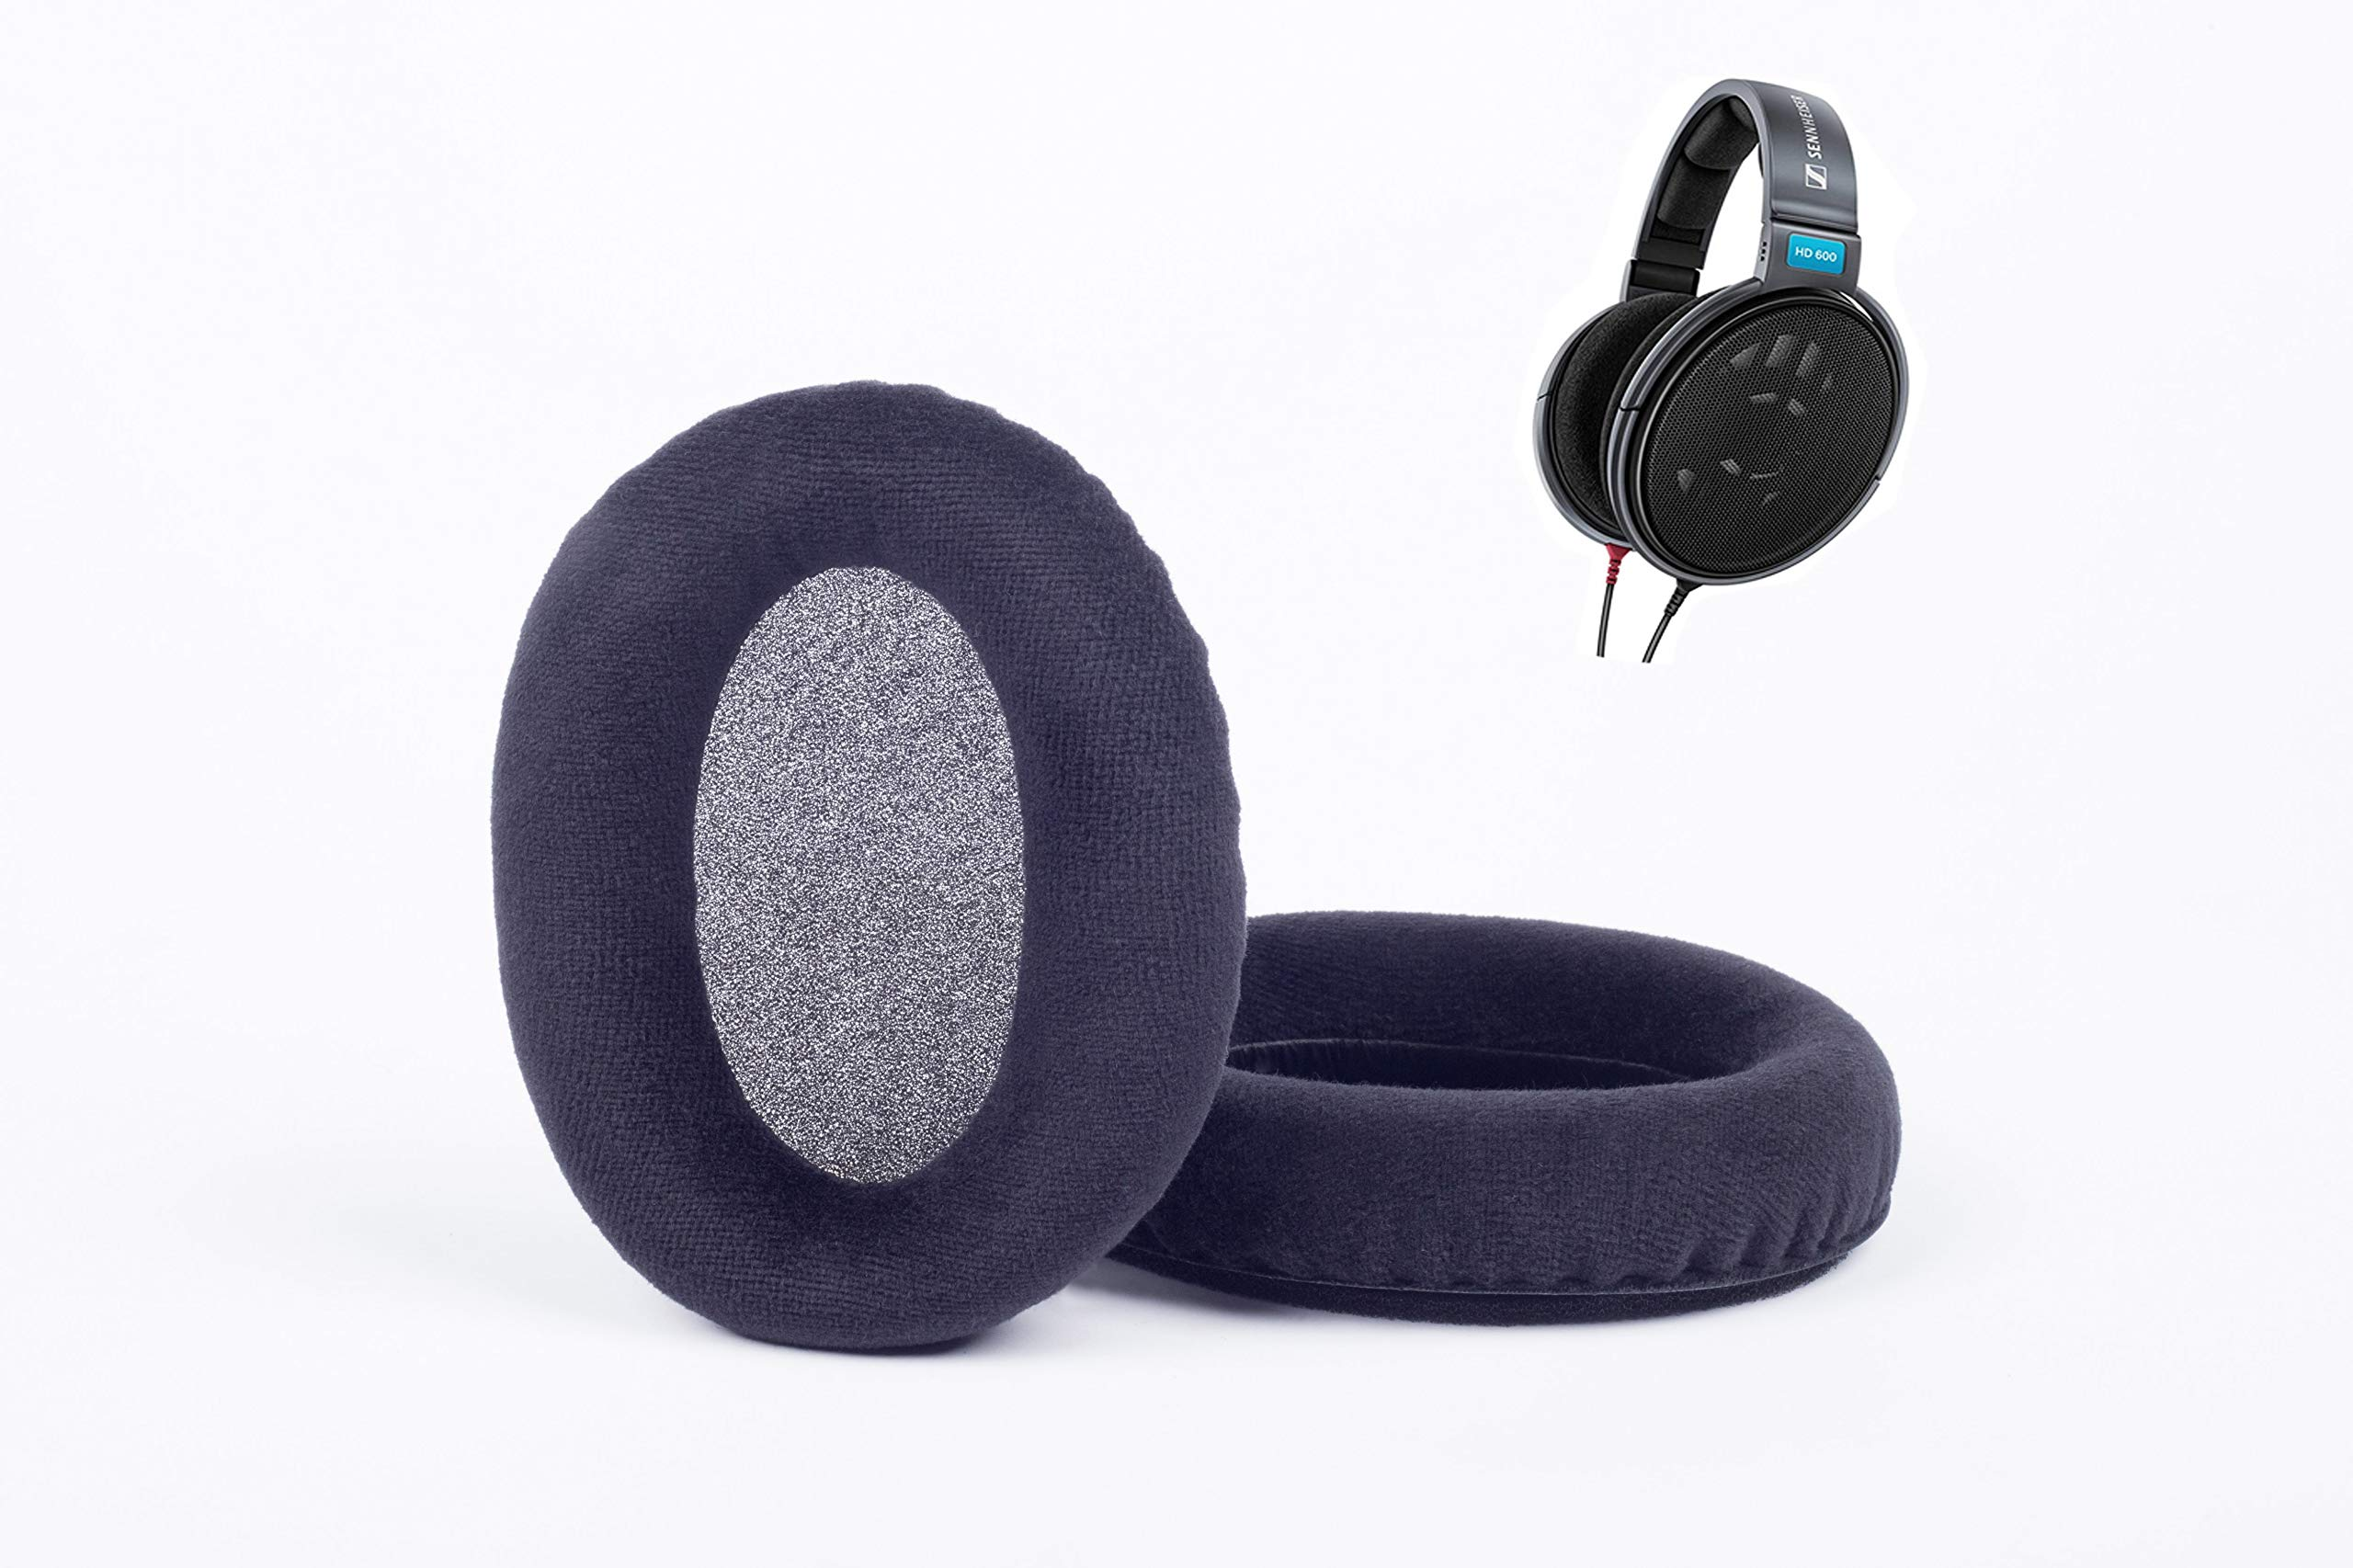 Magic Cushion Headphones replacment Ear Pads for sennheiser HD600,Compatible with HD650 / HD580 / HD565 / HD545 (Velour Black)